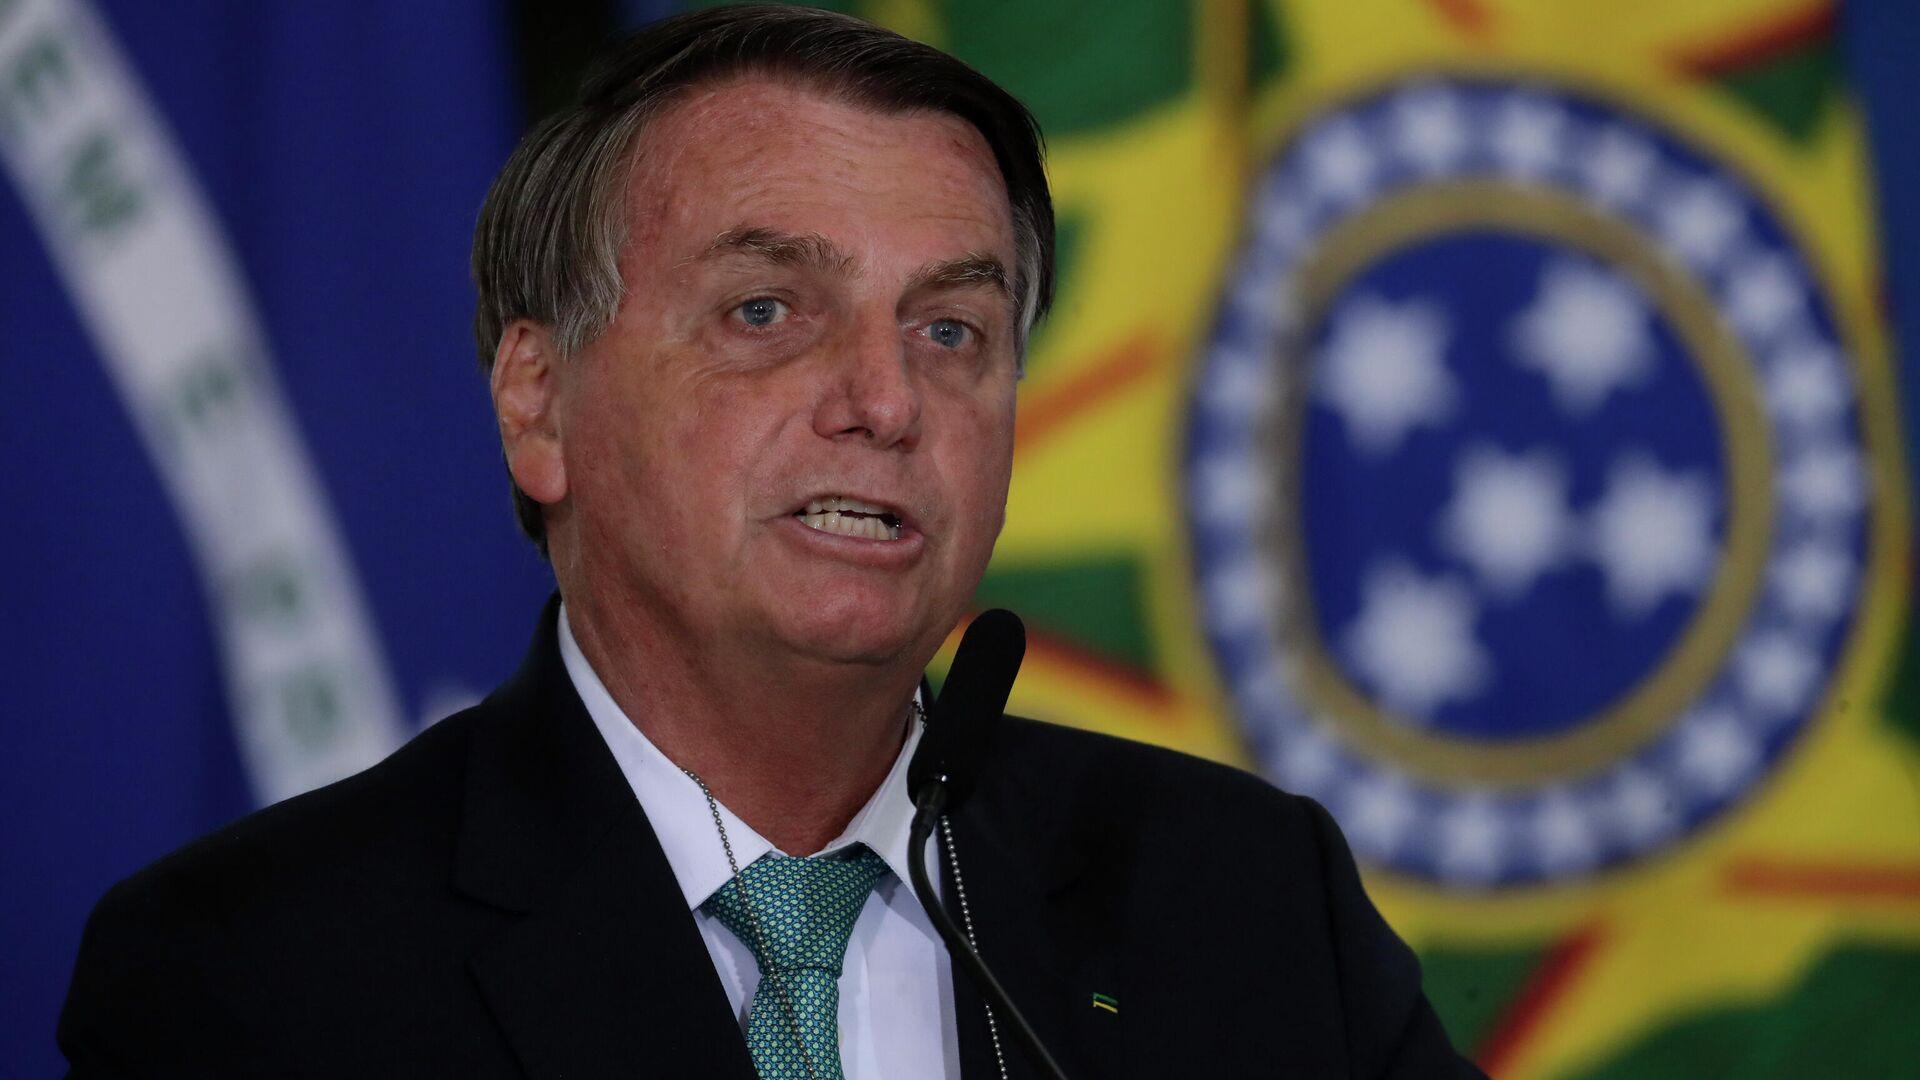 Brasilianischer Präsident Jair Bolsonaro  - SNA, 1920, 02.06.2021